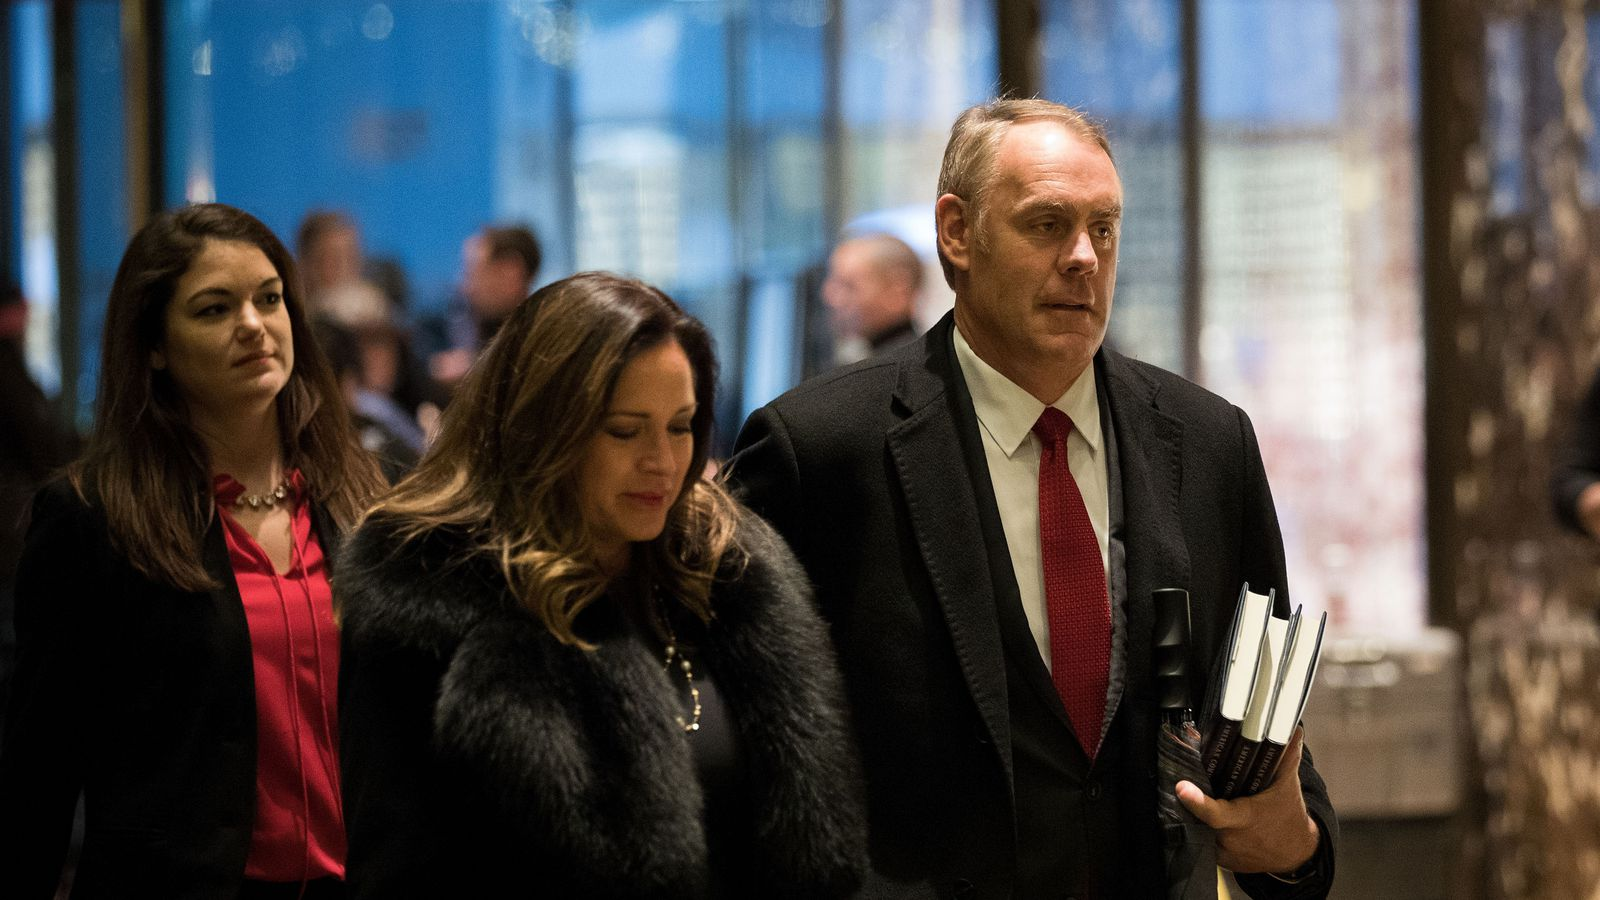 Trump Picks Representative Ryan Zinke For Secretary Of The Interior The Verge